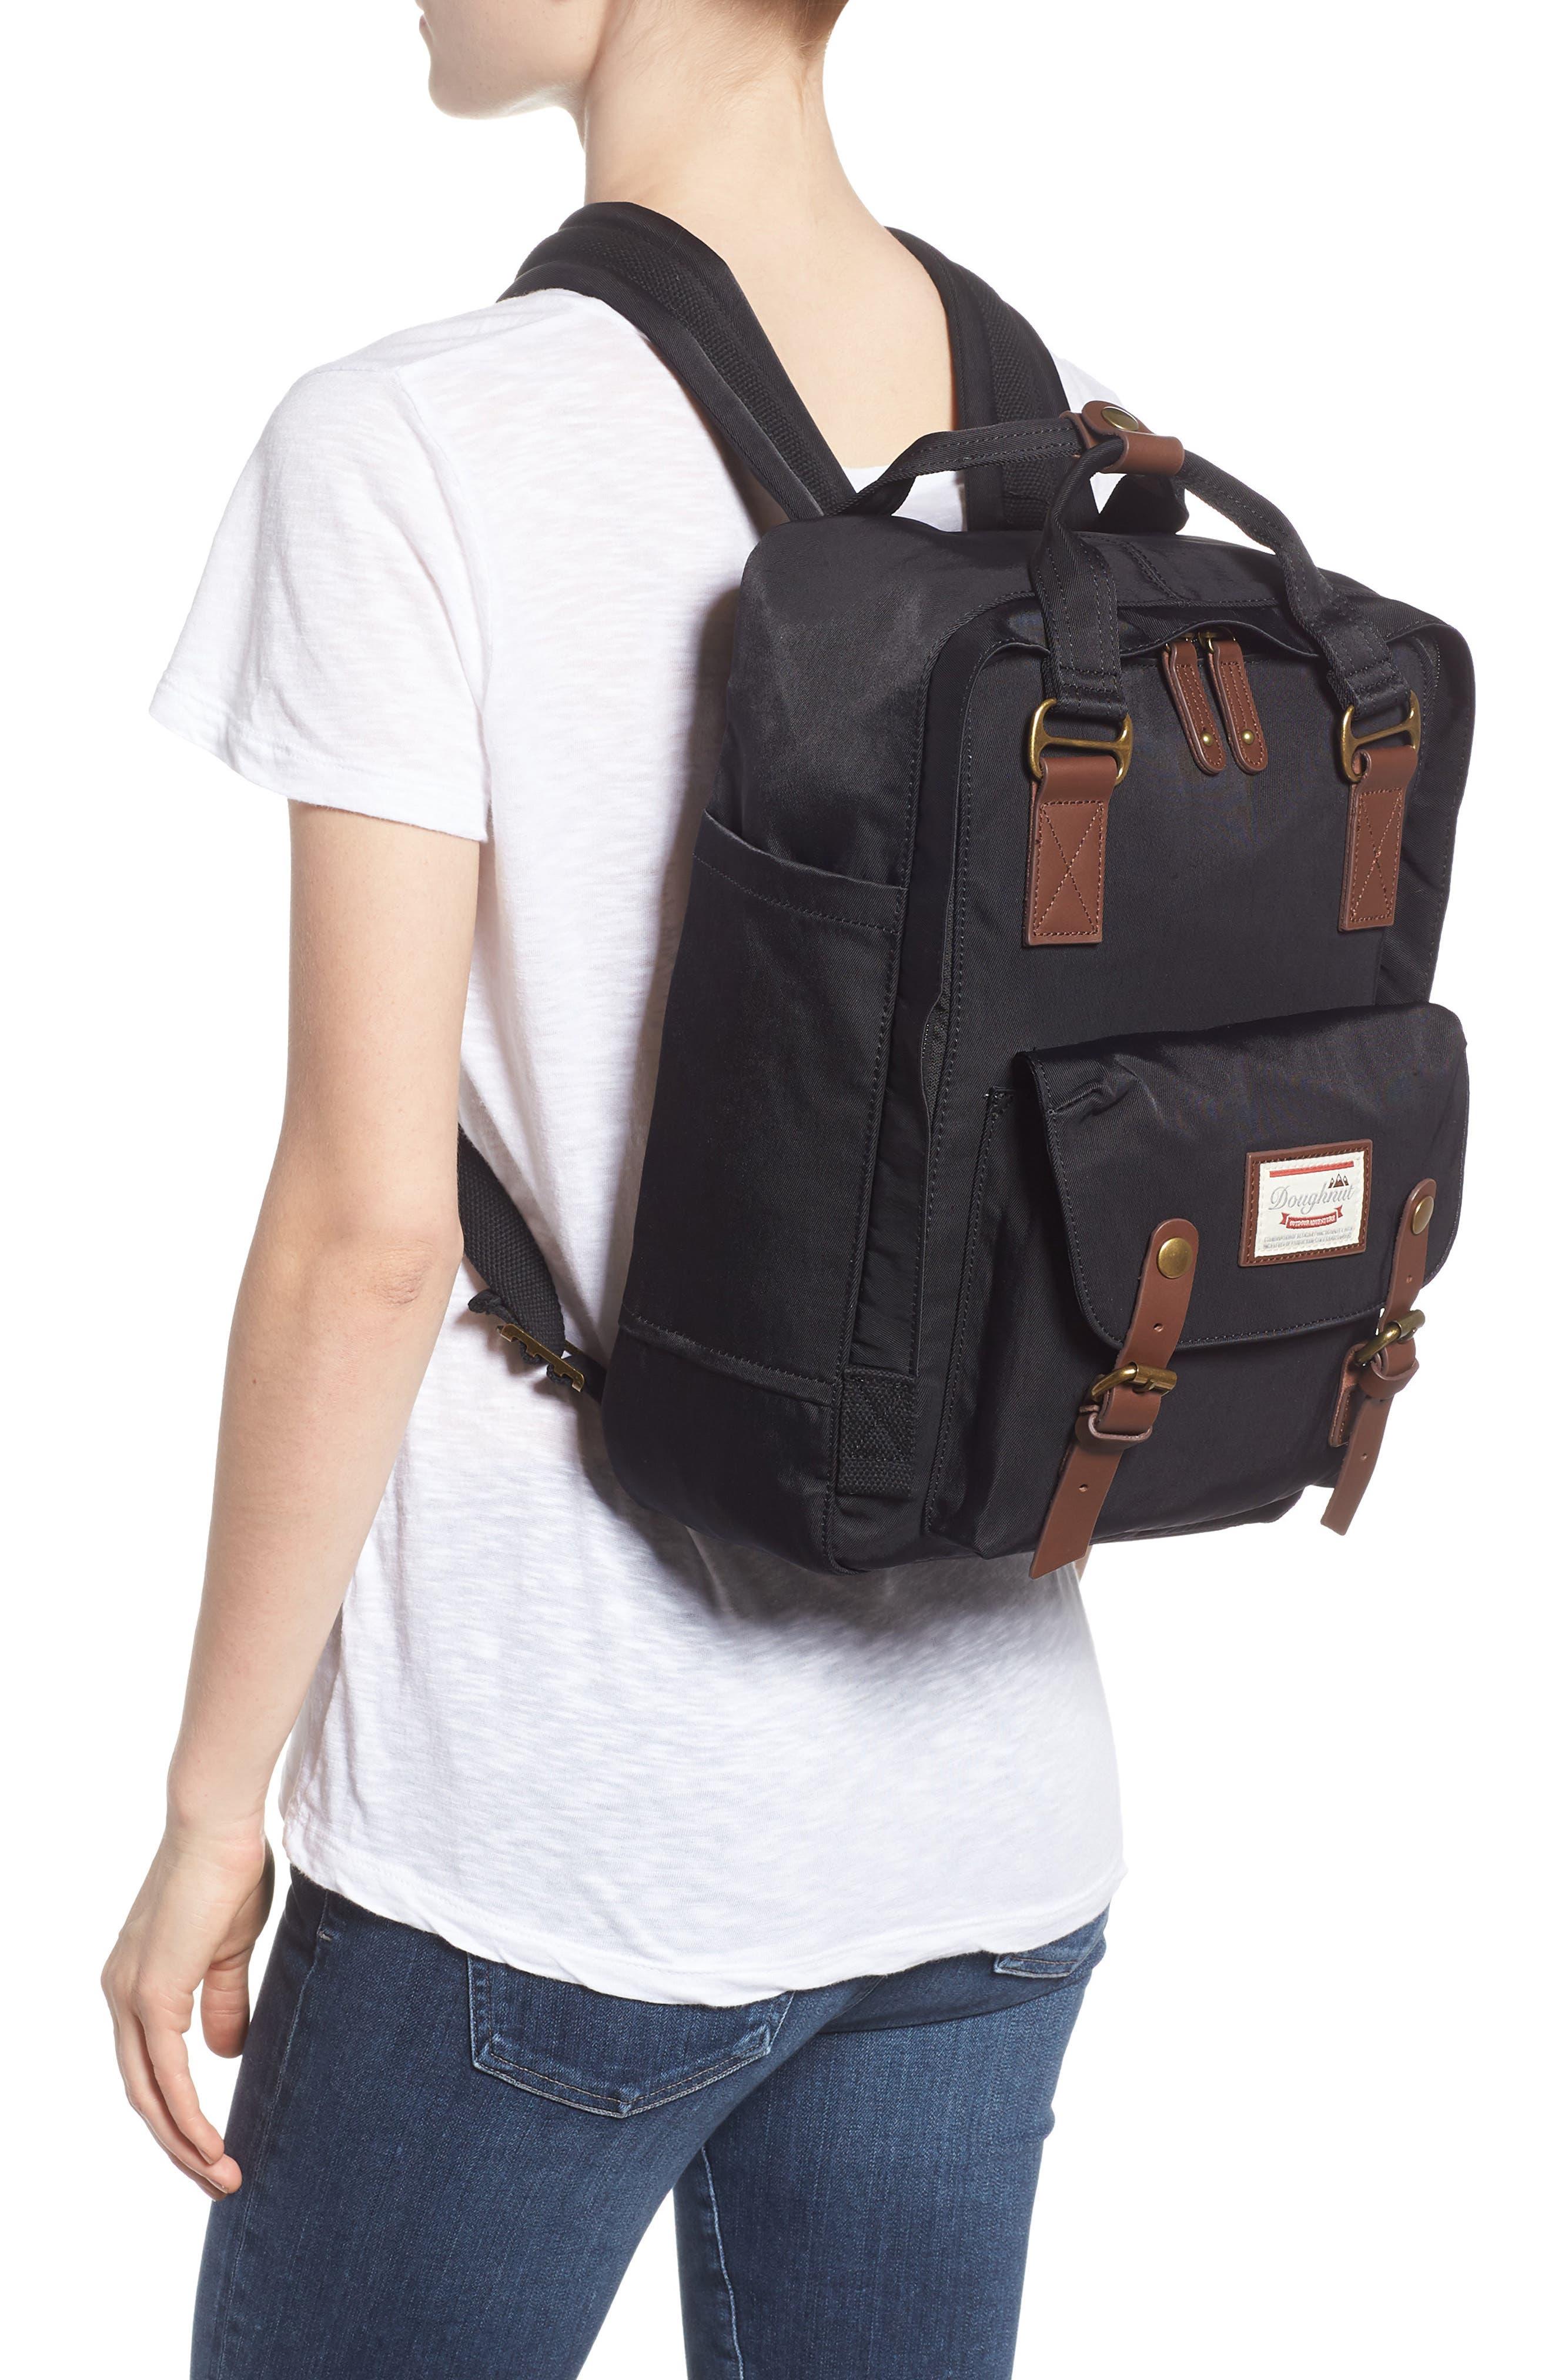 Macaroon Water Resistant Backpack,                             Alternate thumbnail 2, color,                             BLACK